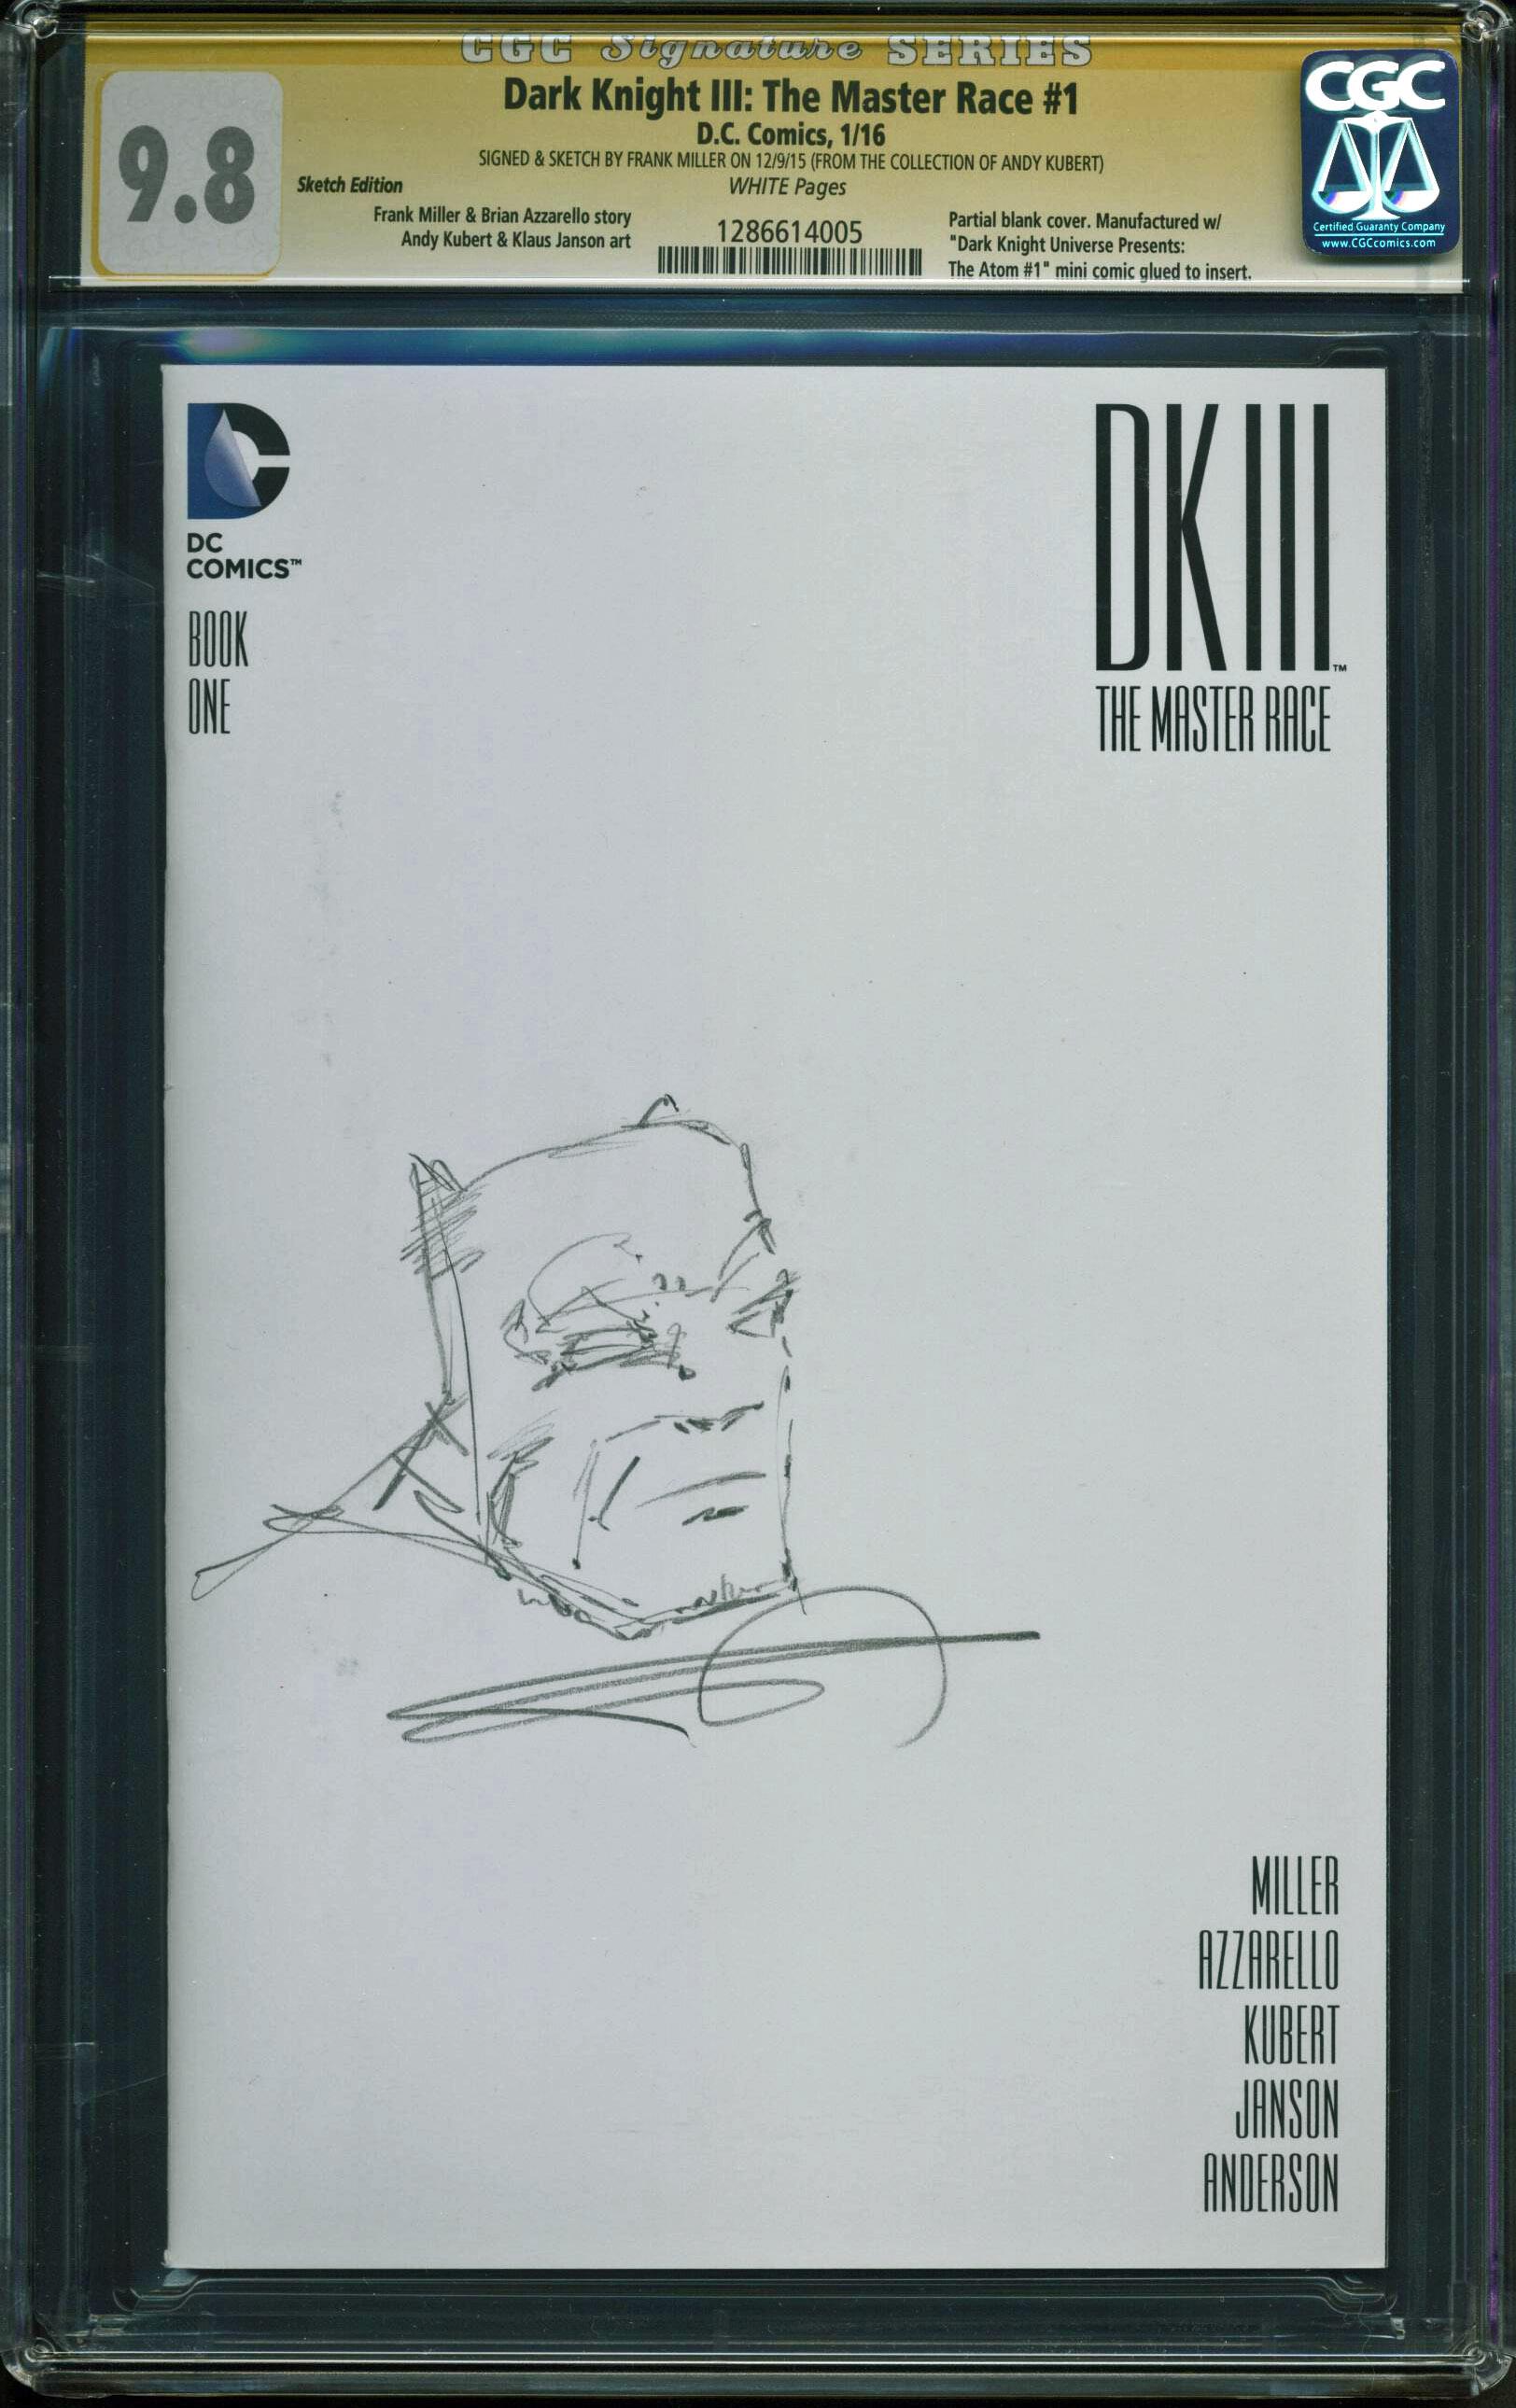 Frank Miller Signed Batman Dark Knight III The Master Race #1 w/ Sketch CGC 9.8